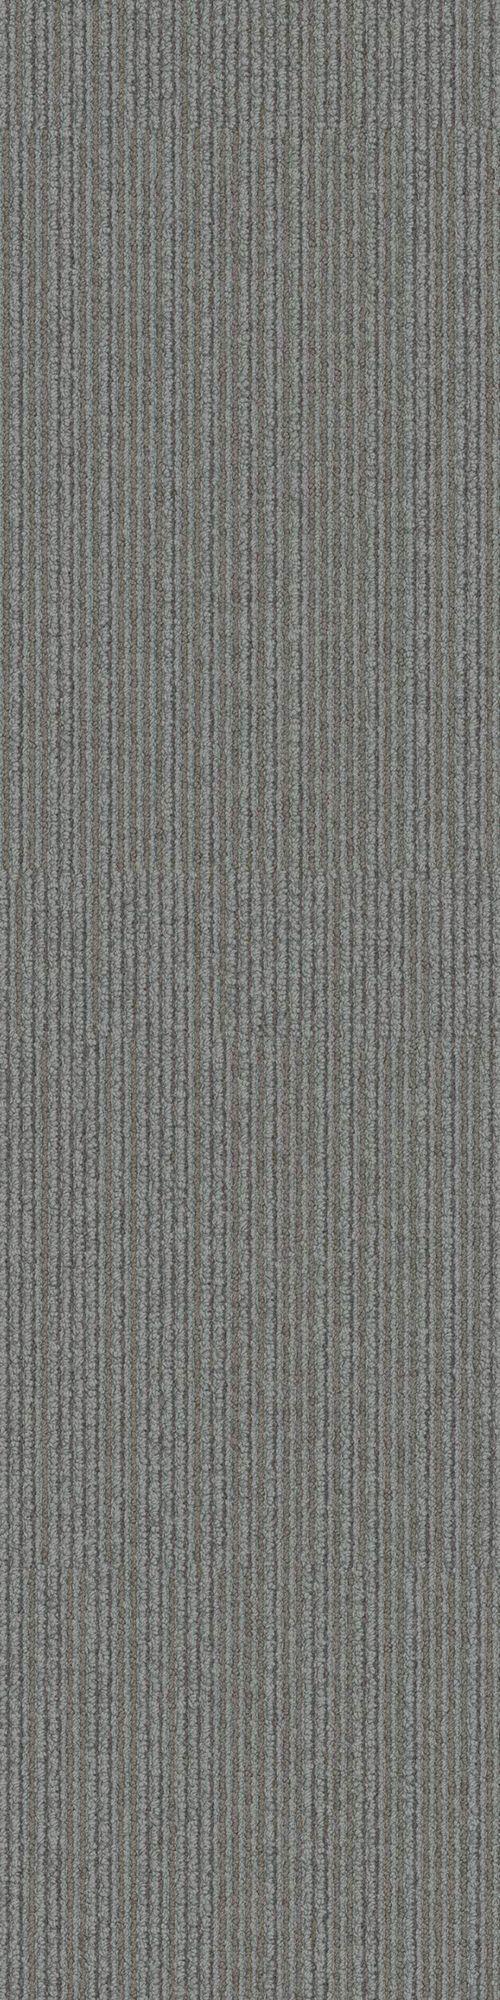 Interface carpet tile: On Line Color name: Stone Variant 2